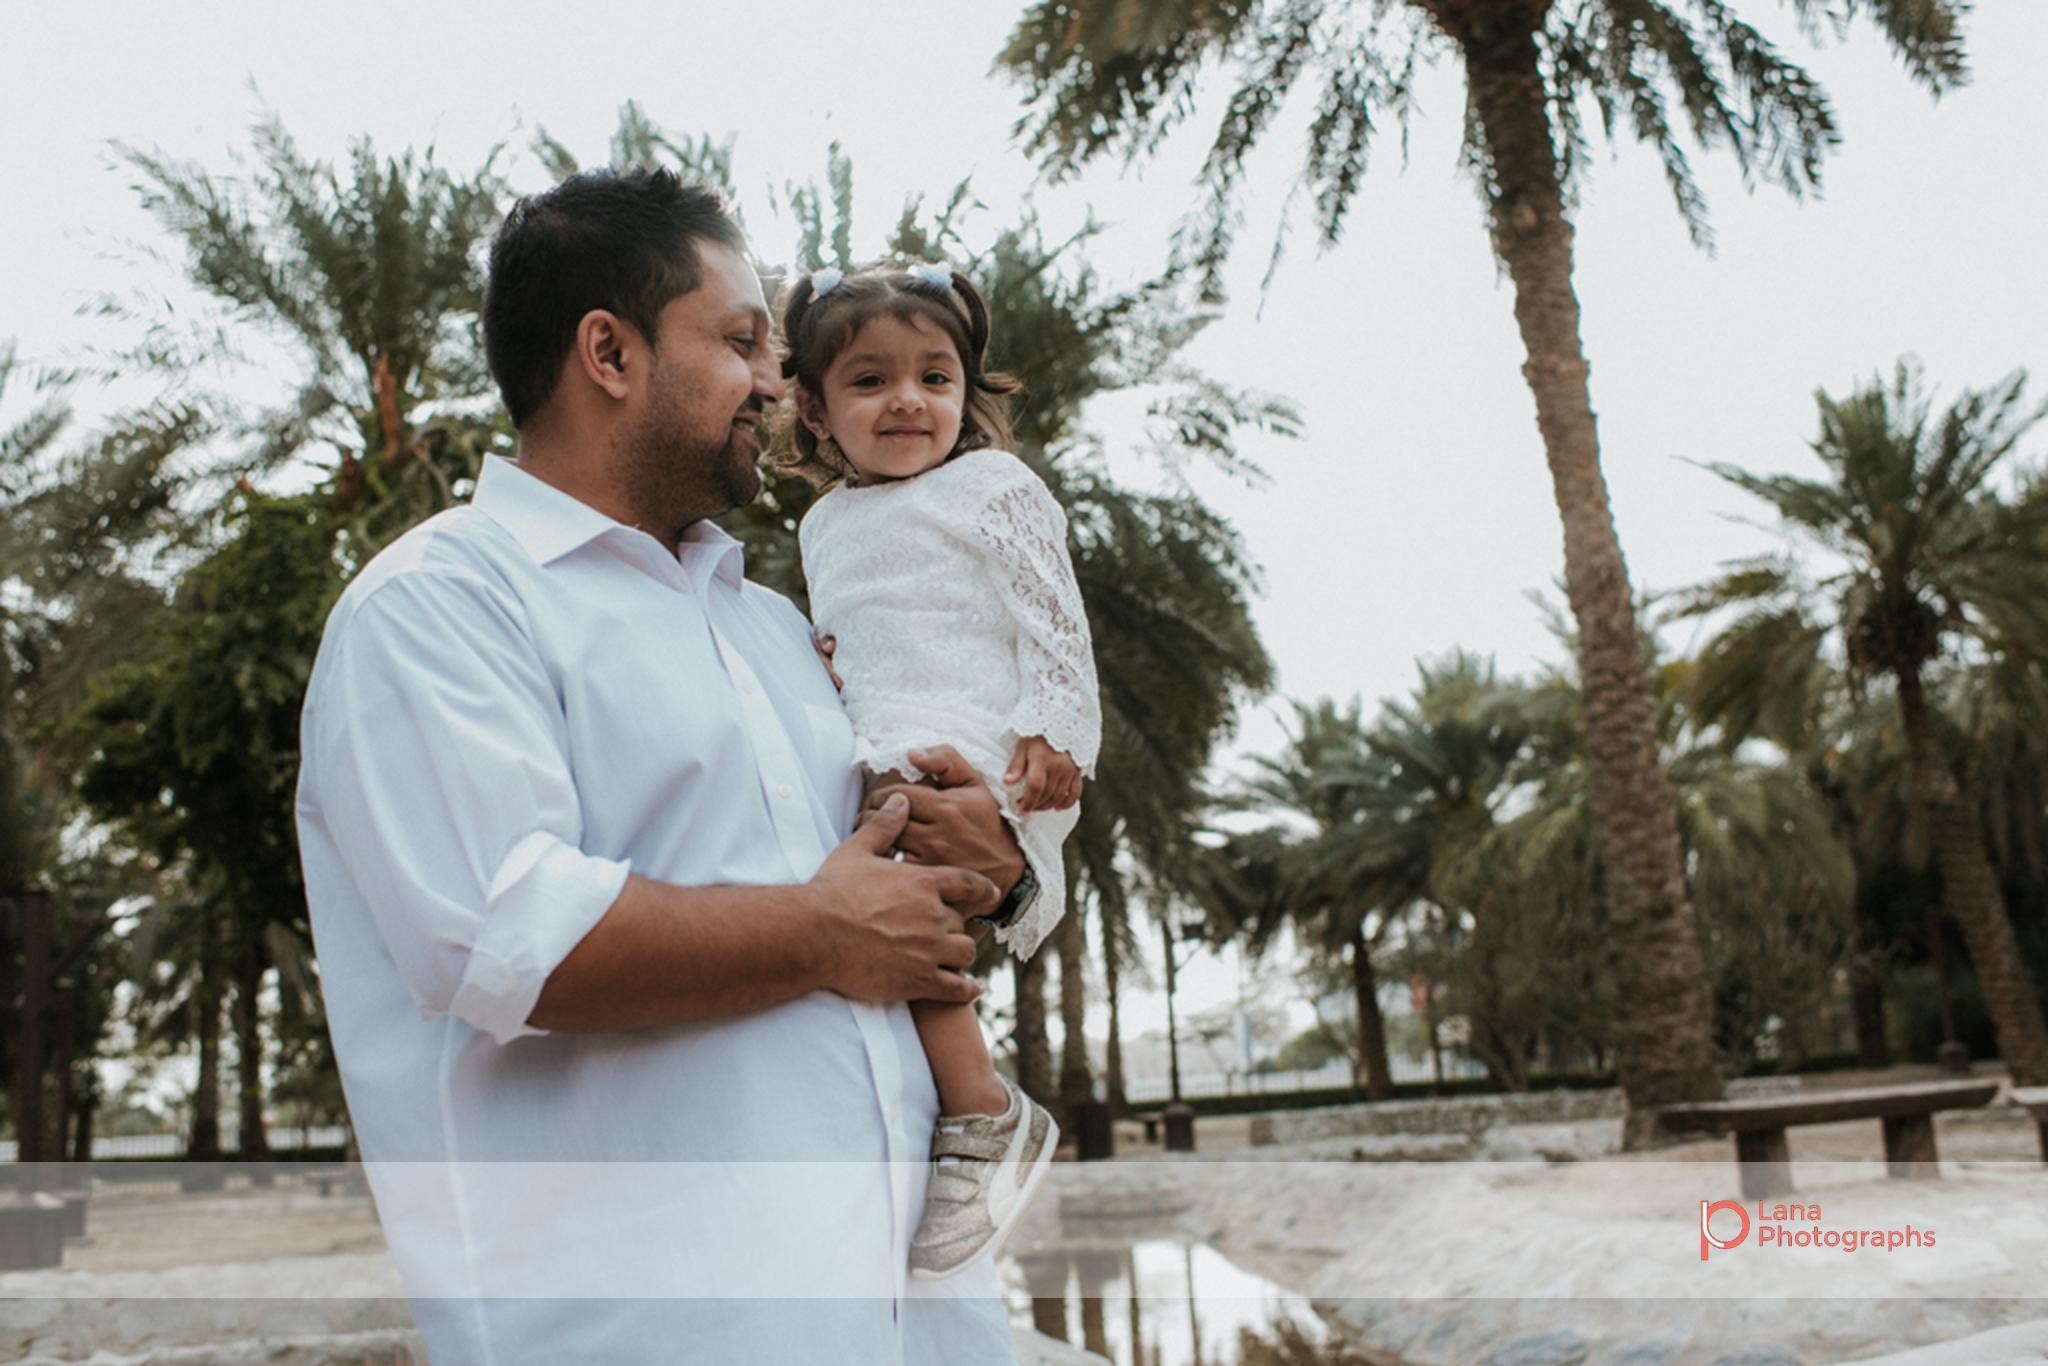 Lana Photographs Family Photographer Dubai Top Family Photographers father carrying girl under palm trees